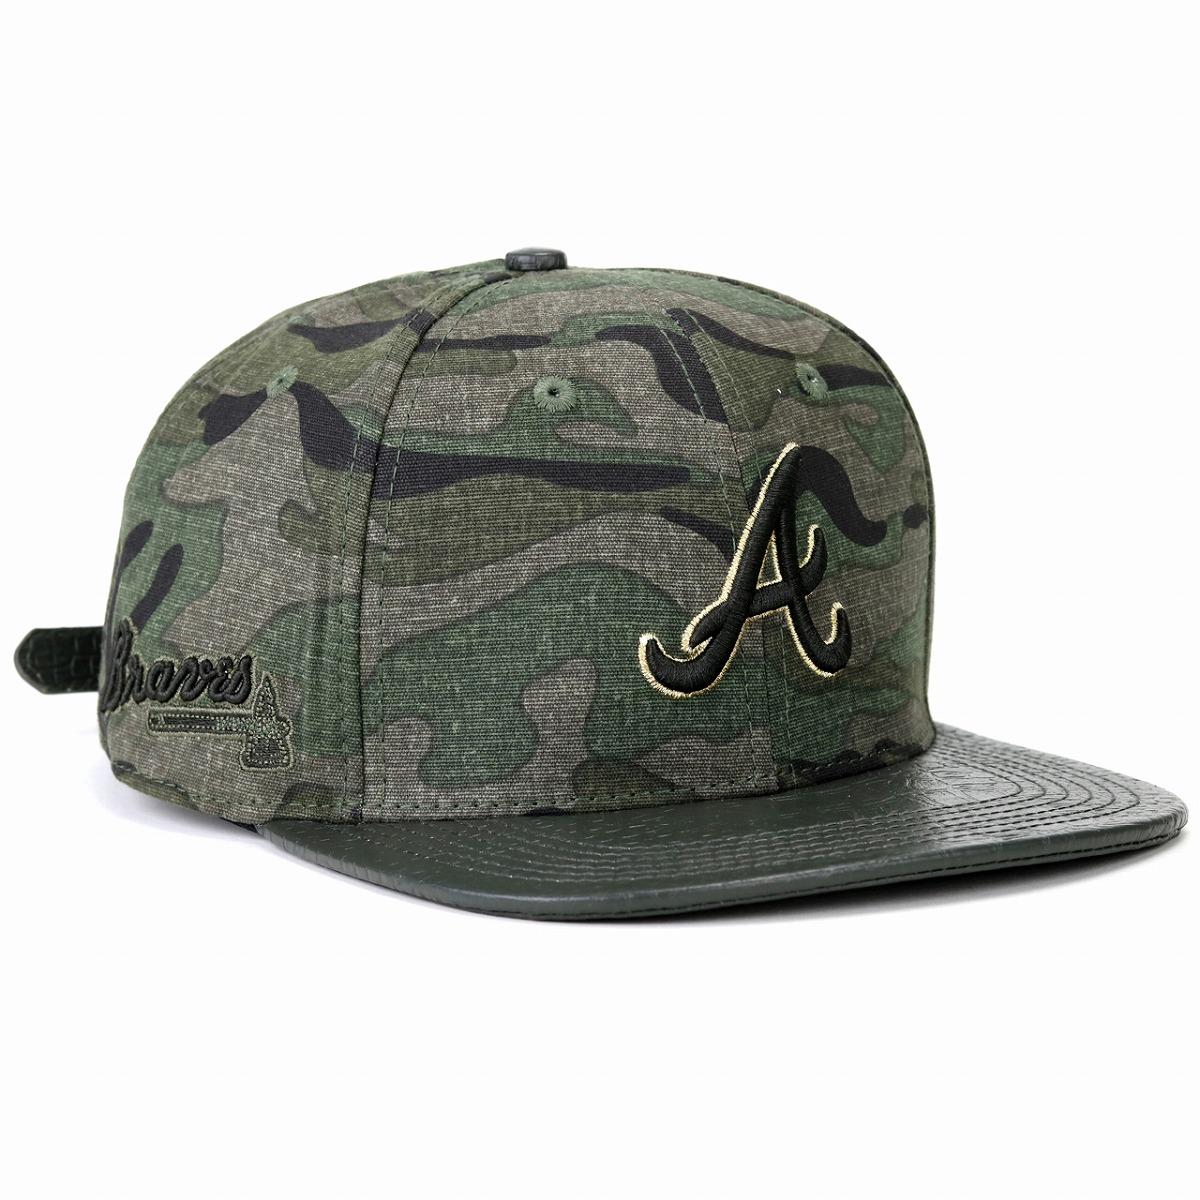 new product c59ad 01a4a Atlanta Braves logo camouflage cap professional standard baseball cap men  gap Dis hat MLB Atlanta Braves Logo Kamov LARA cap Pro Standard duck ...